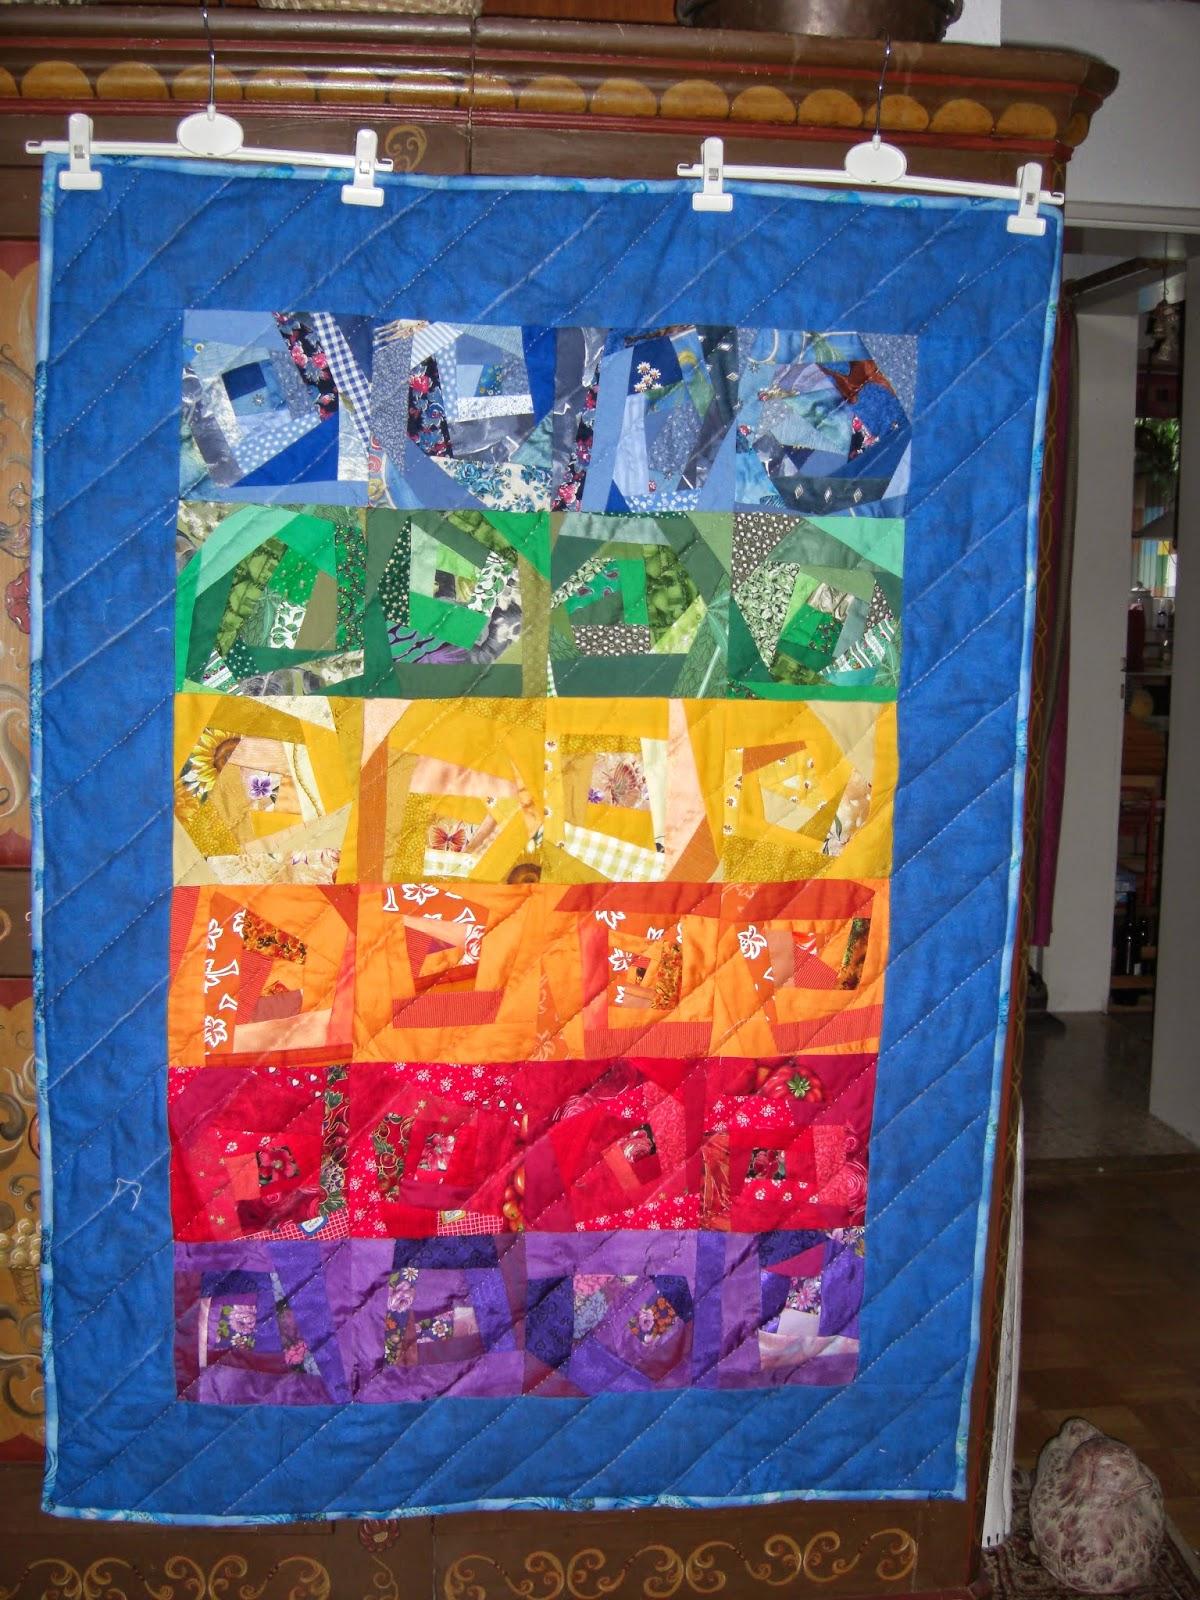 Decke gequiltet in Regenbogenfarben